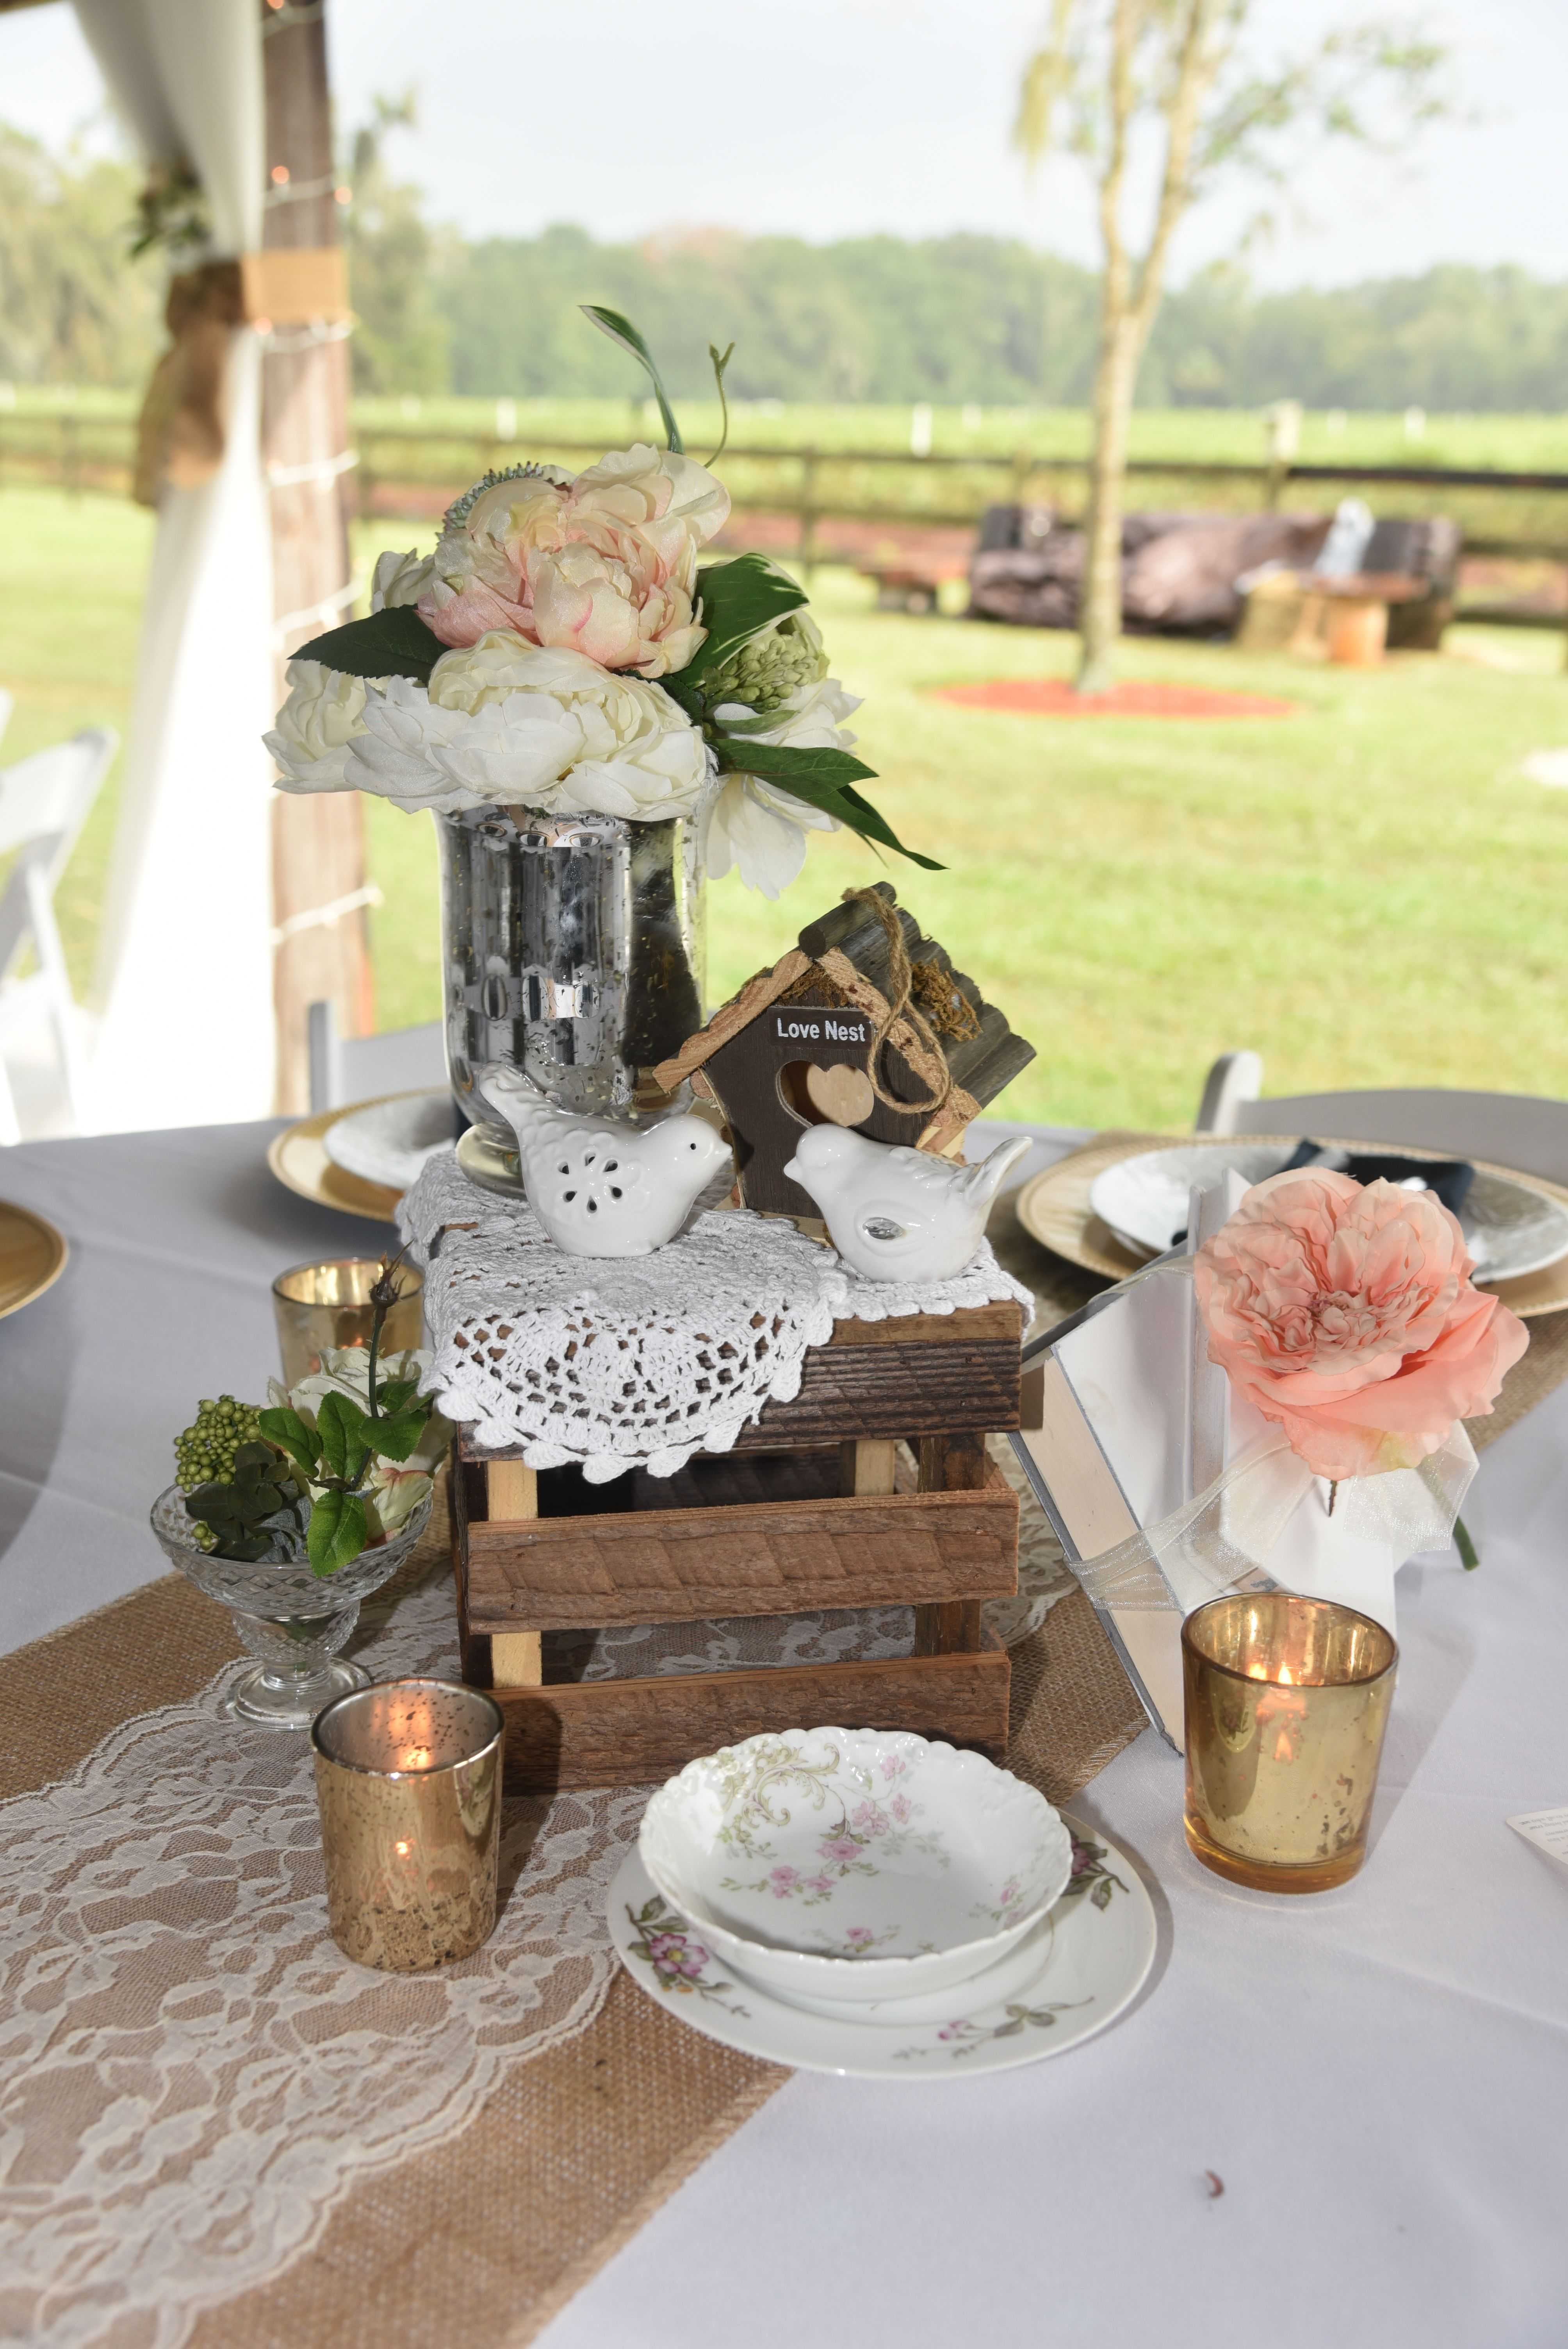 Vintage, Elegant Table Design, Wood Crate, Antique China, Peach Peony,